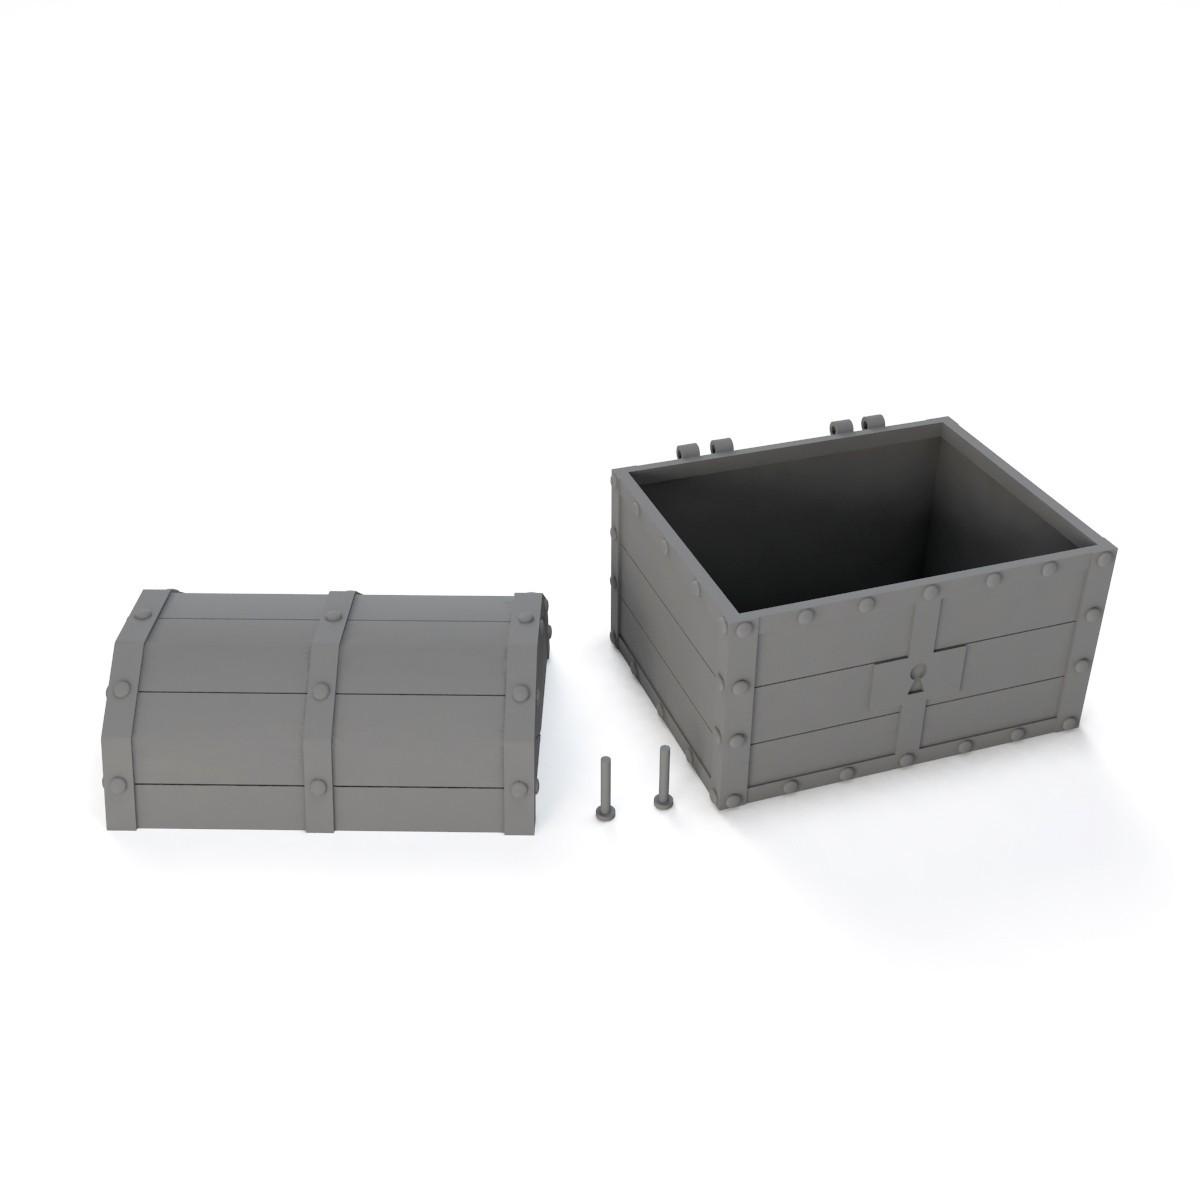 13.jpg Download STL file Treasure chest (Zelda: Ocarina of time) • 3D printable object, Shigeryu